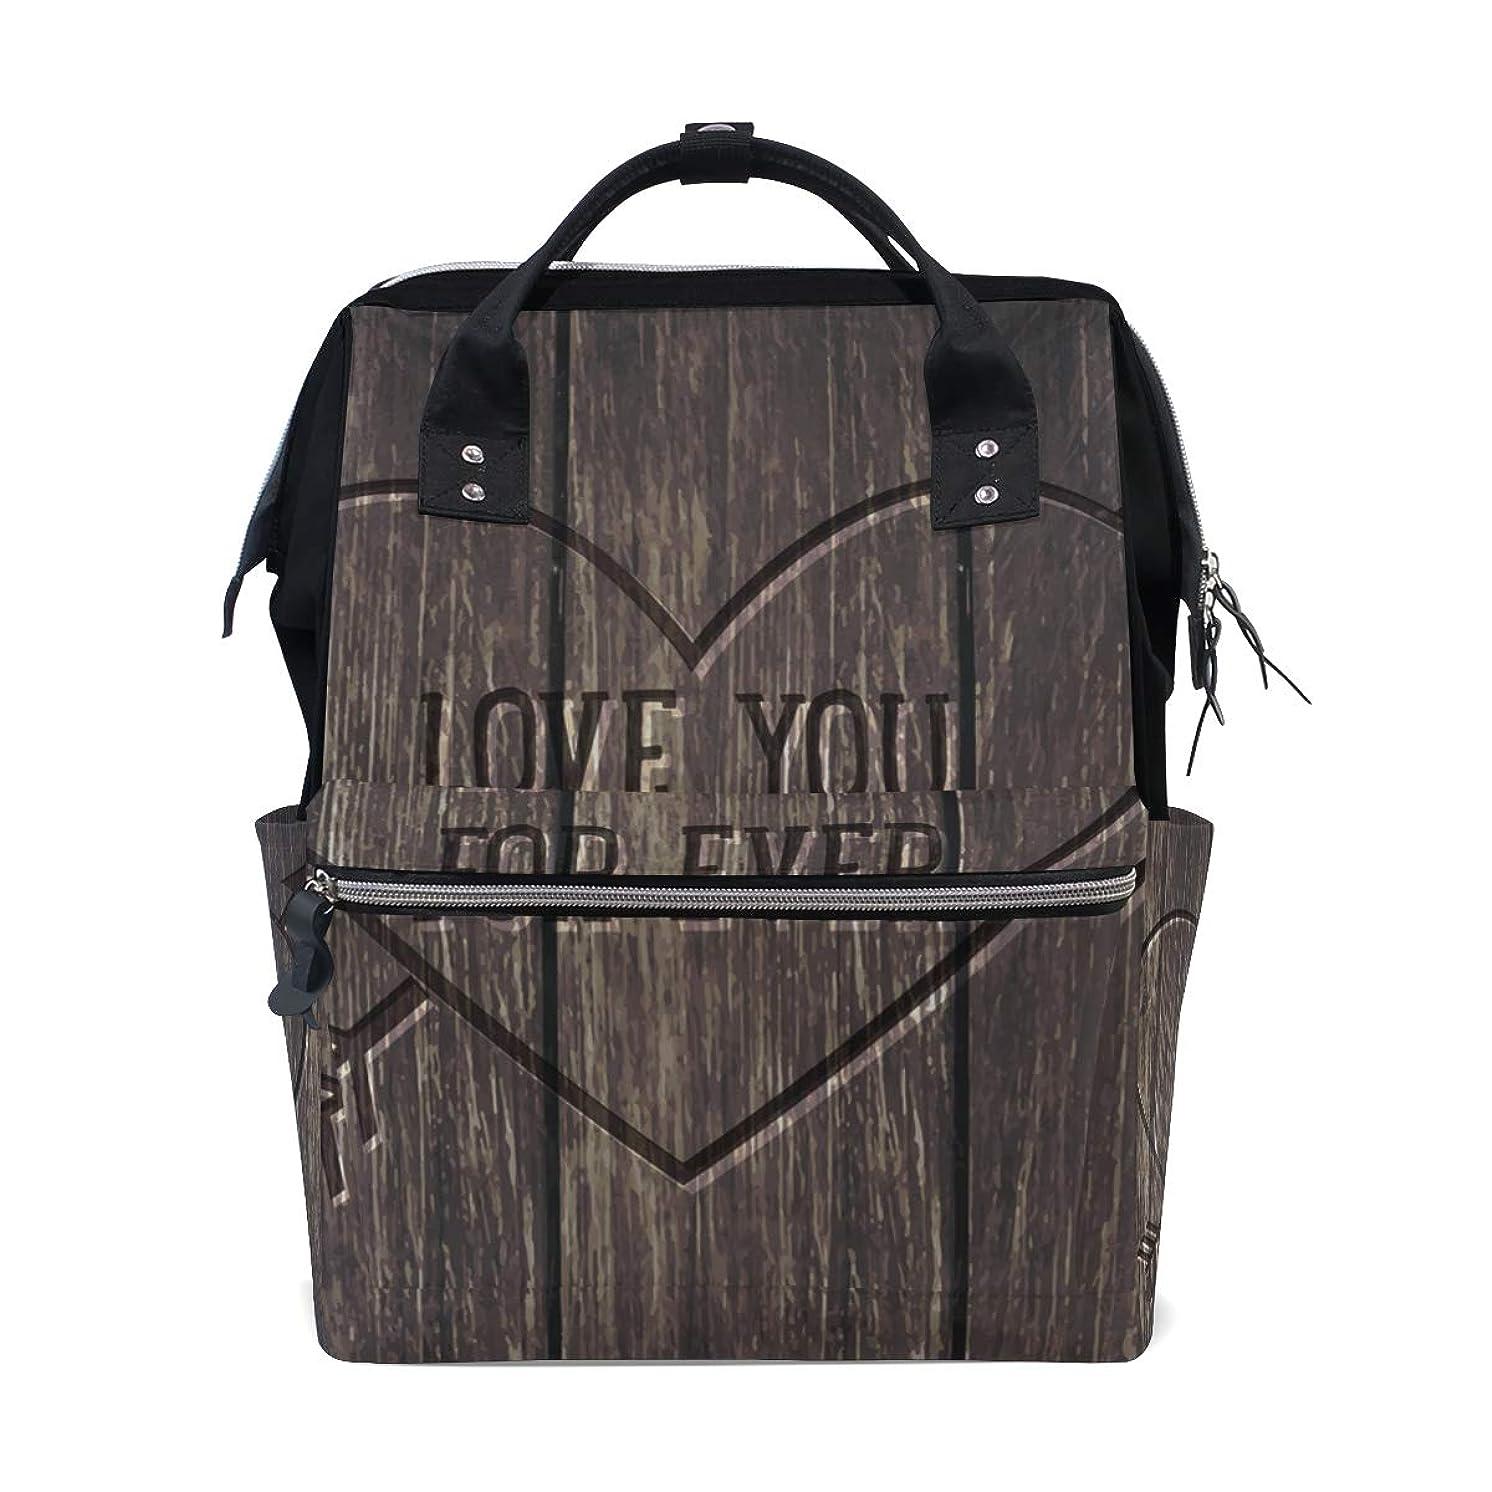 Love You Forever Wooden Texture School Backpack Large Capacity Mummy Bags Laptop Handbag Casual Travel Rucksack Satchel For Women Men Adult Teen Children